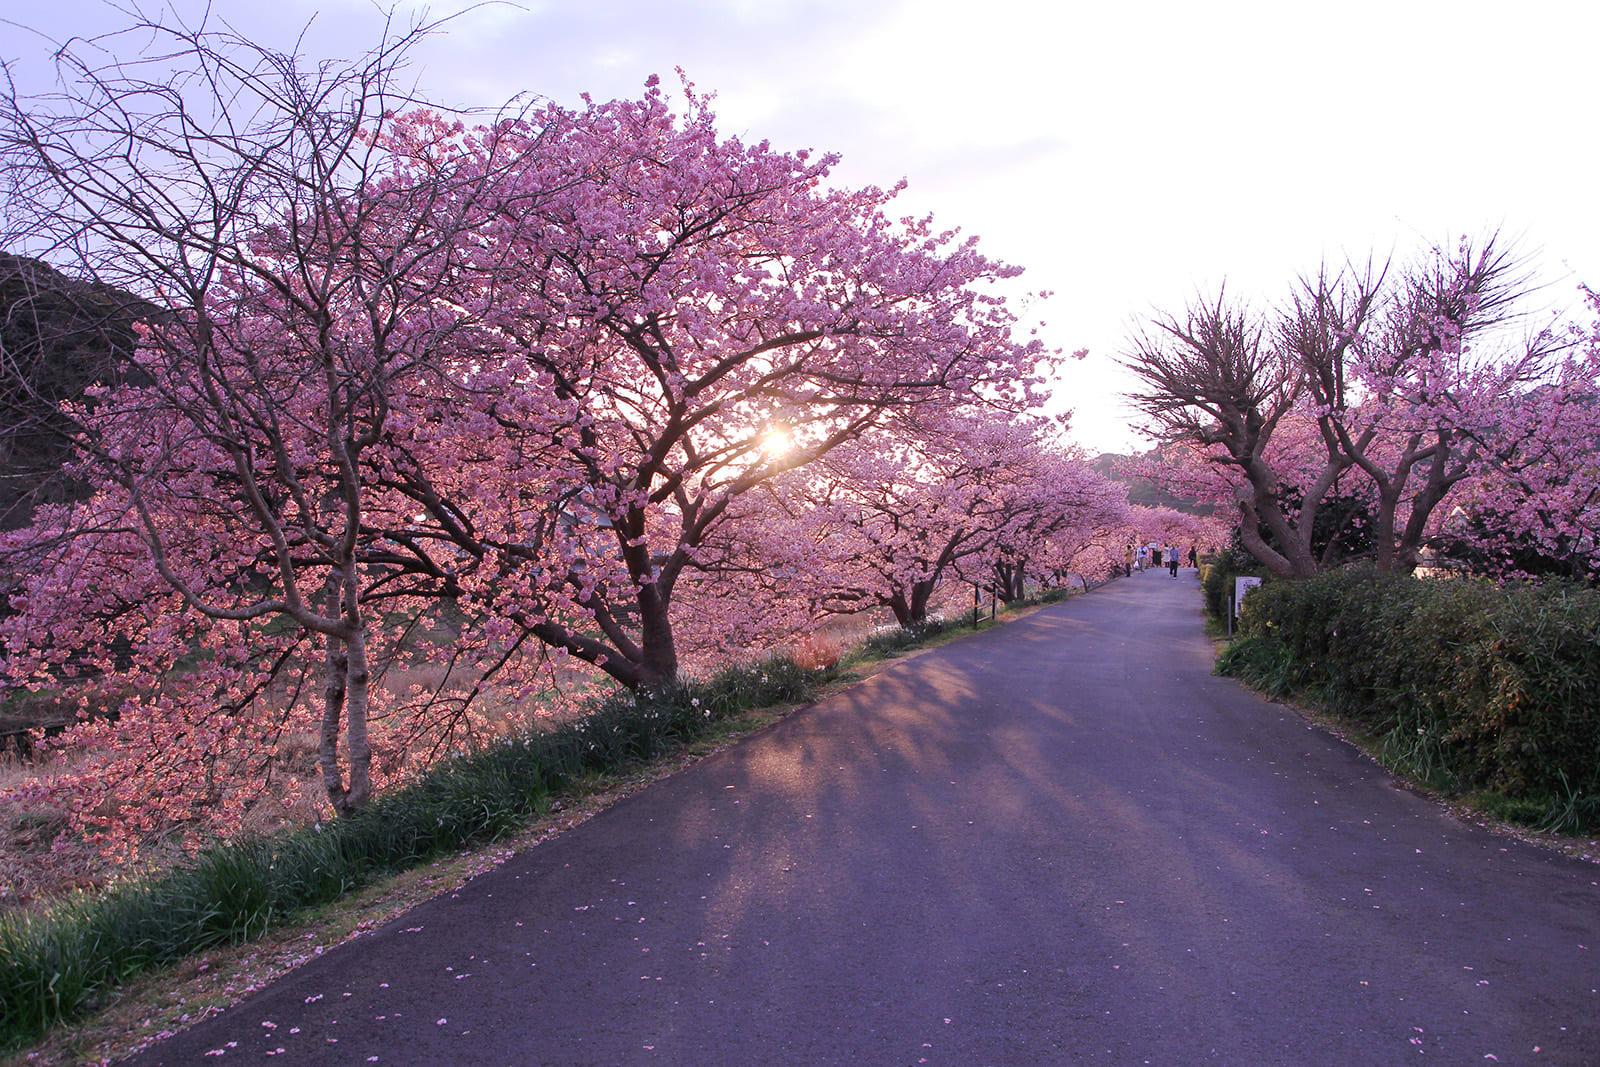 Ngắm Kawazu-zakura và trời sao tại Miurakaigan, Kanazawa-ken 7